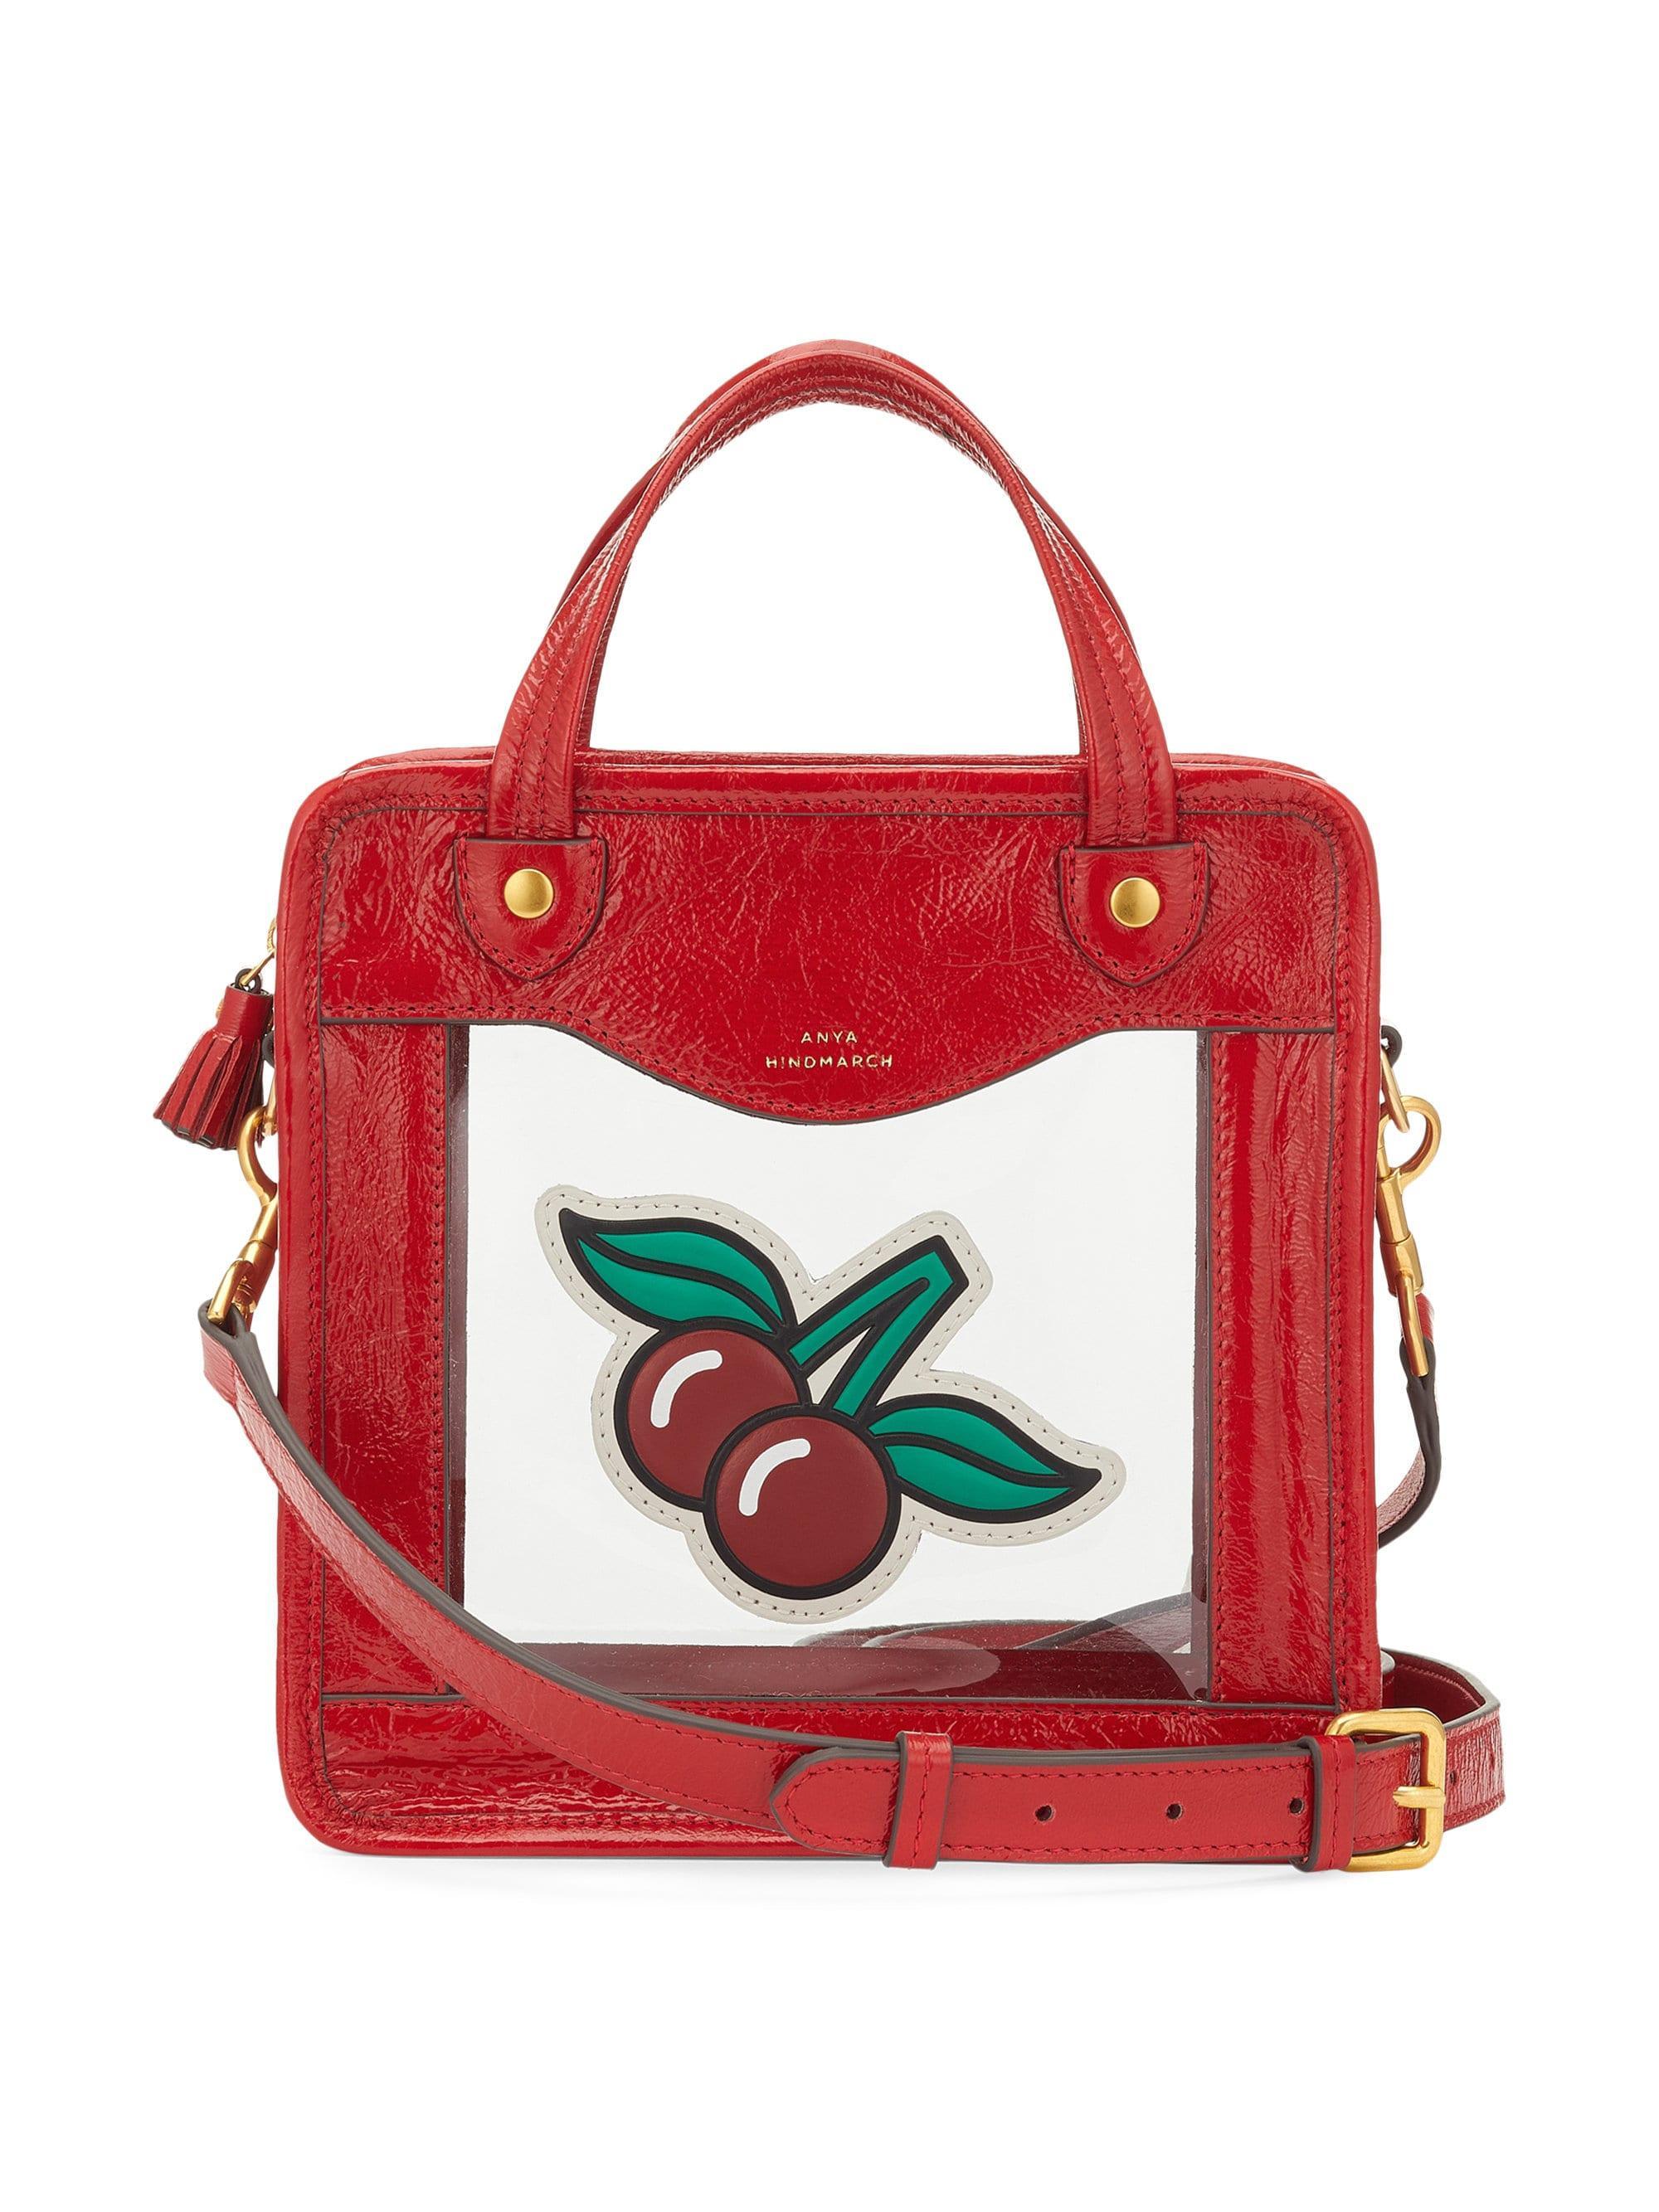 82fac445c13 Lyst - Anya Hindmarch Women s Rainy Day Cherry Crossbody Bag - Red ...